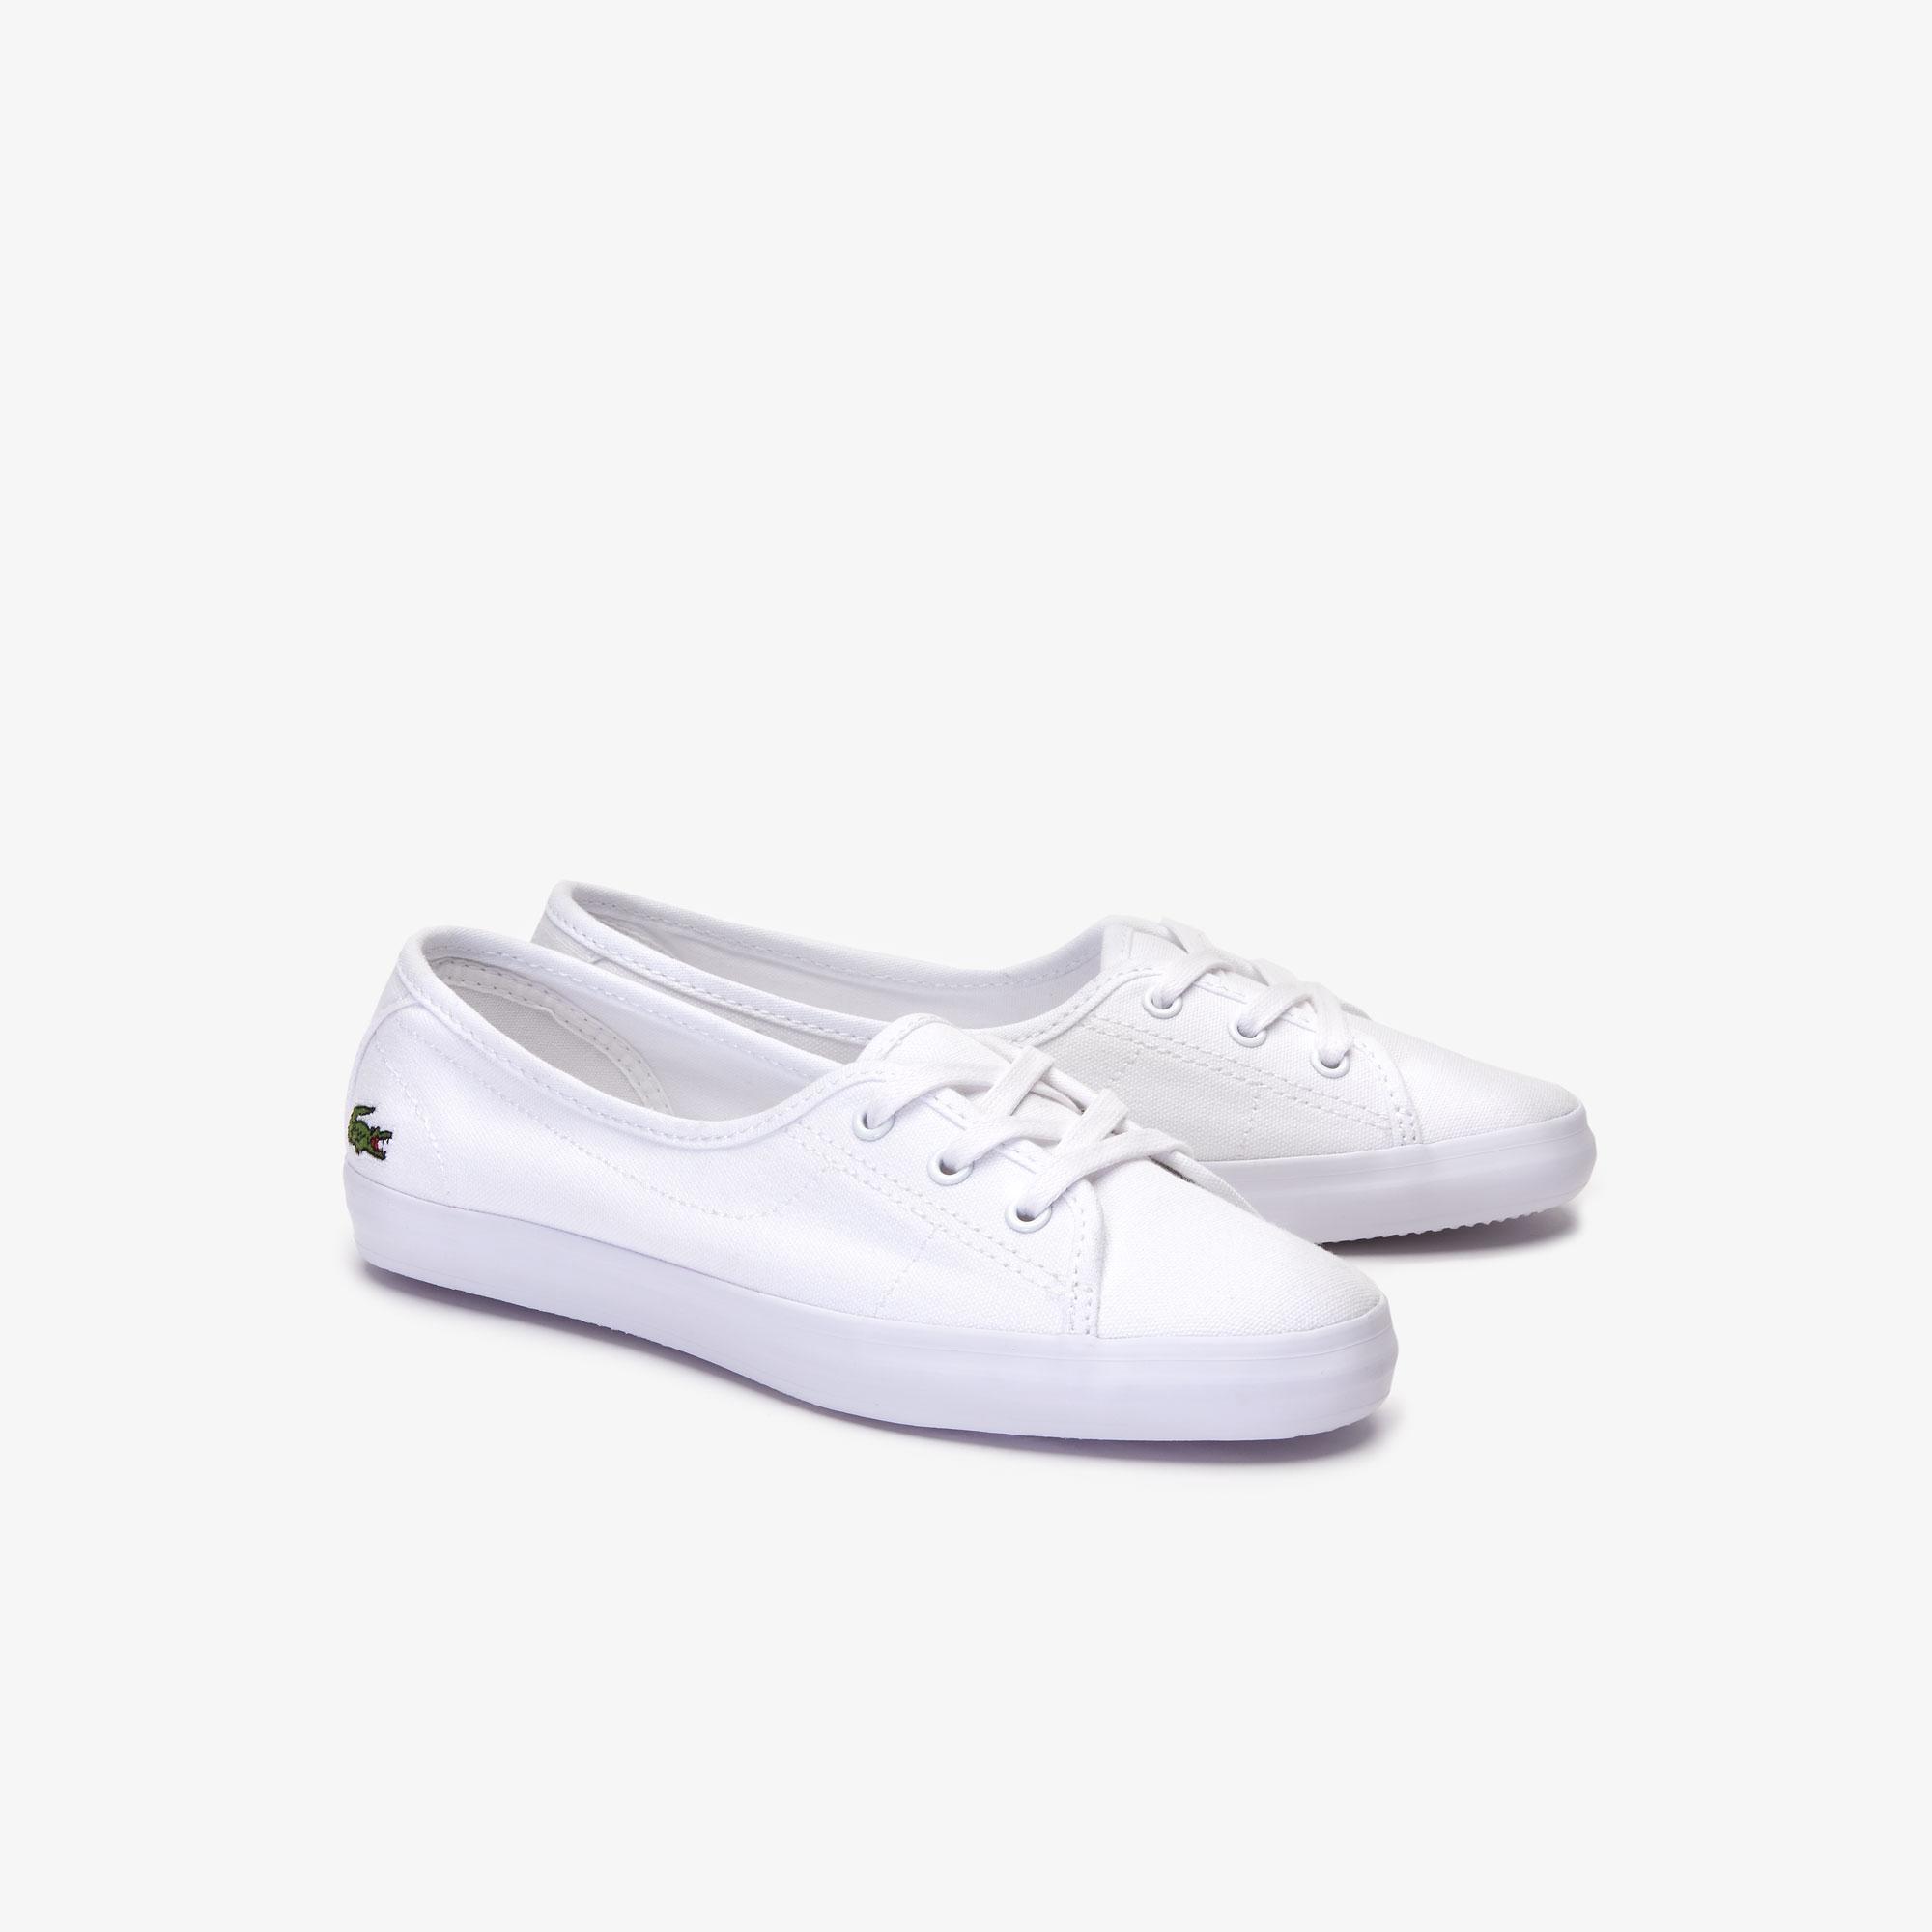 Lacoste Women's Ziane Chunky BL 2 Shoes